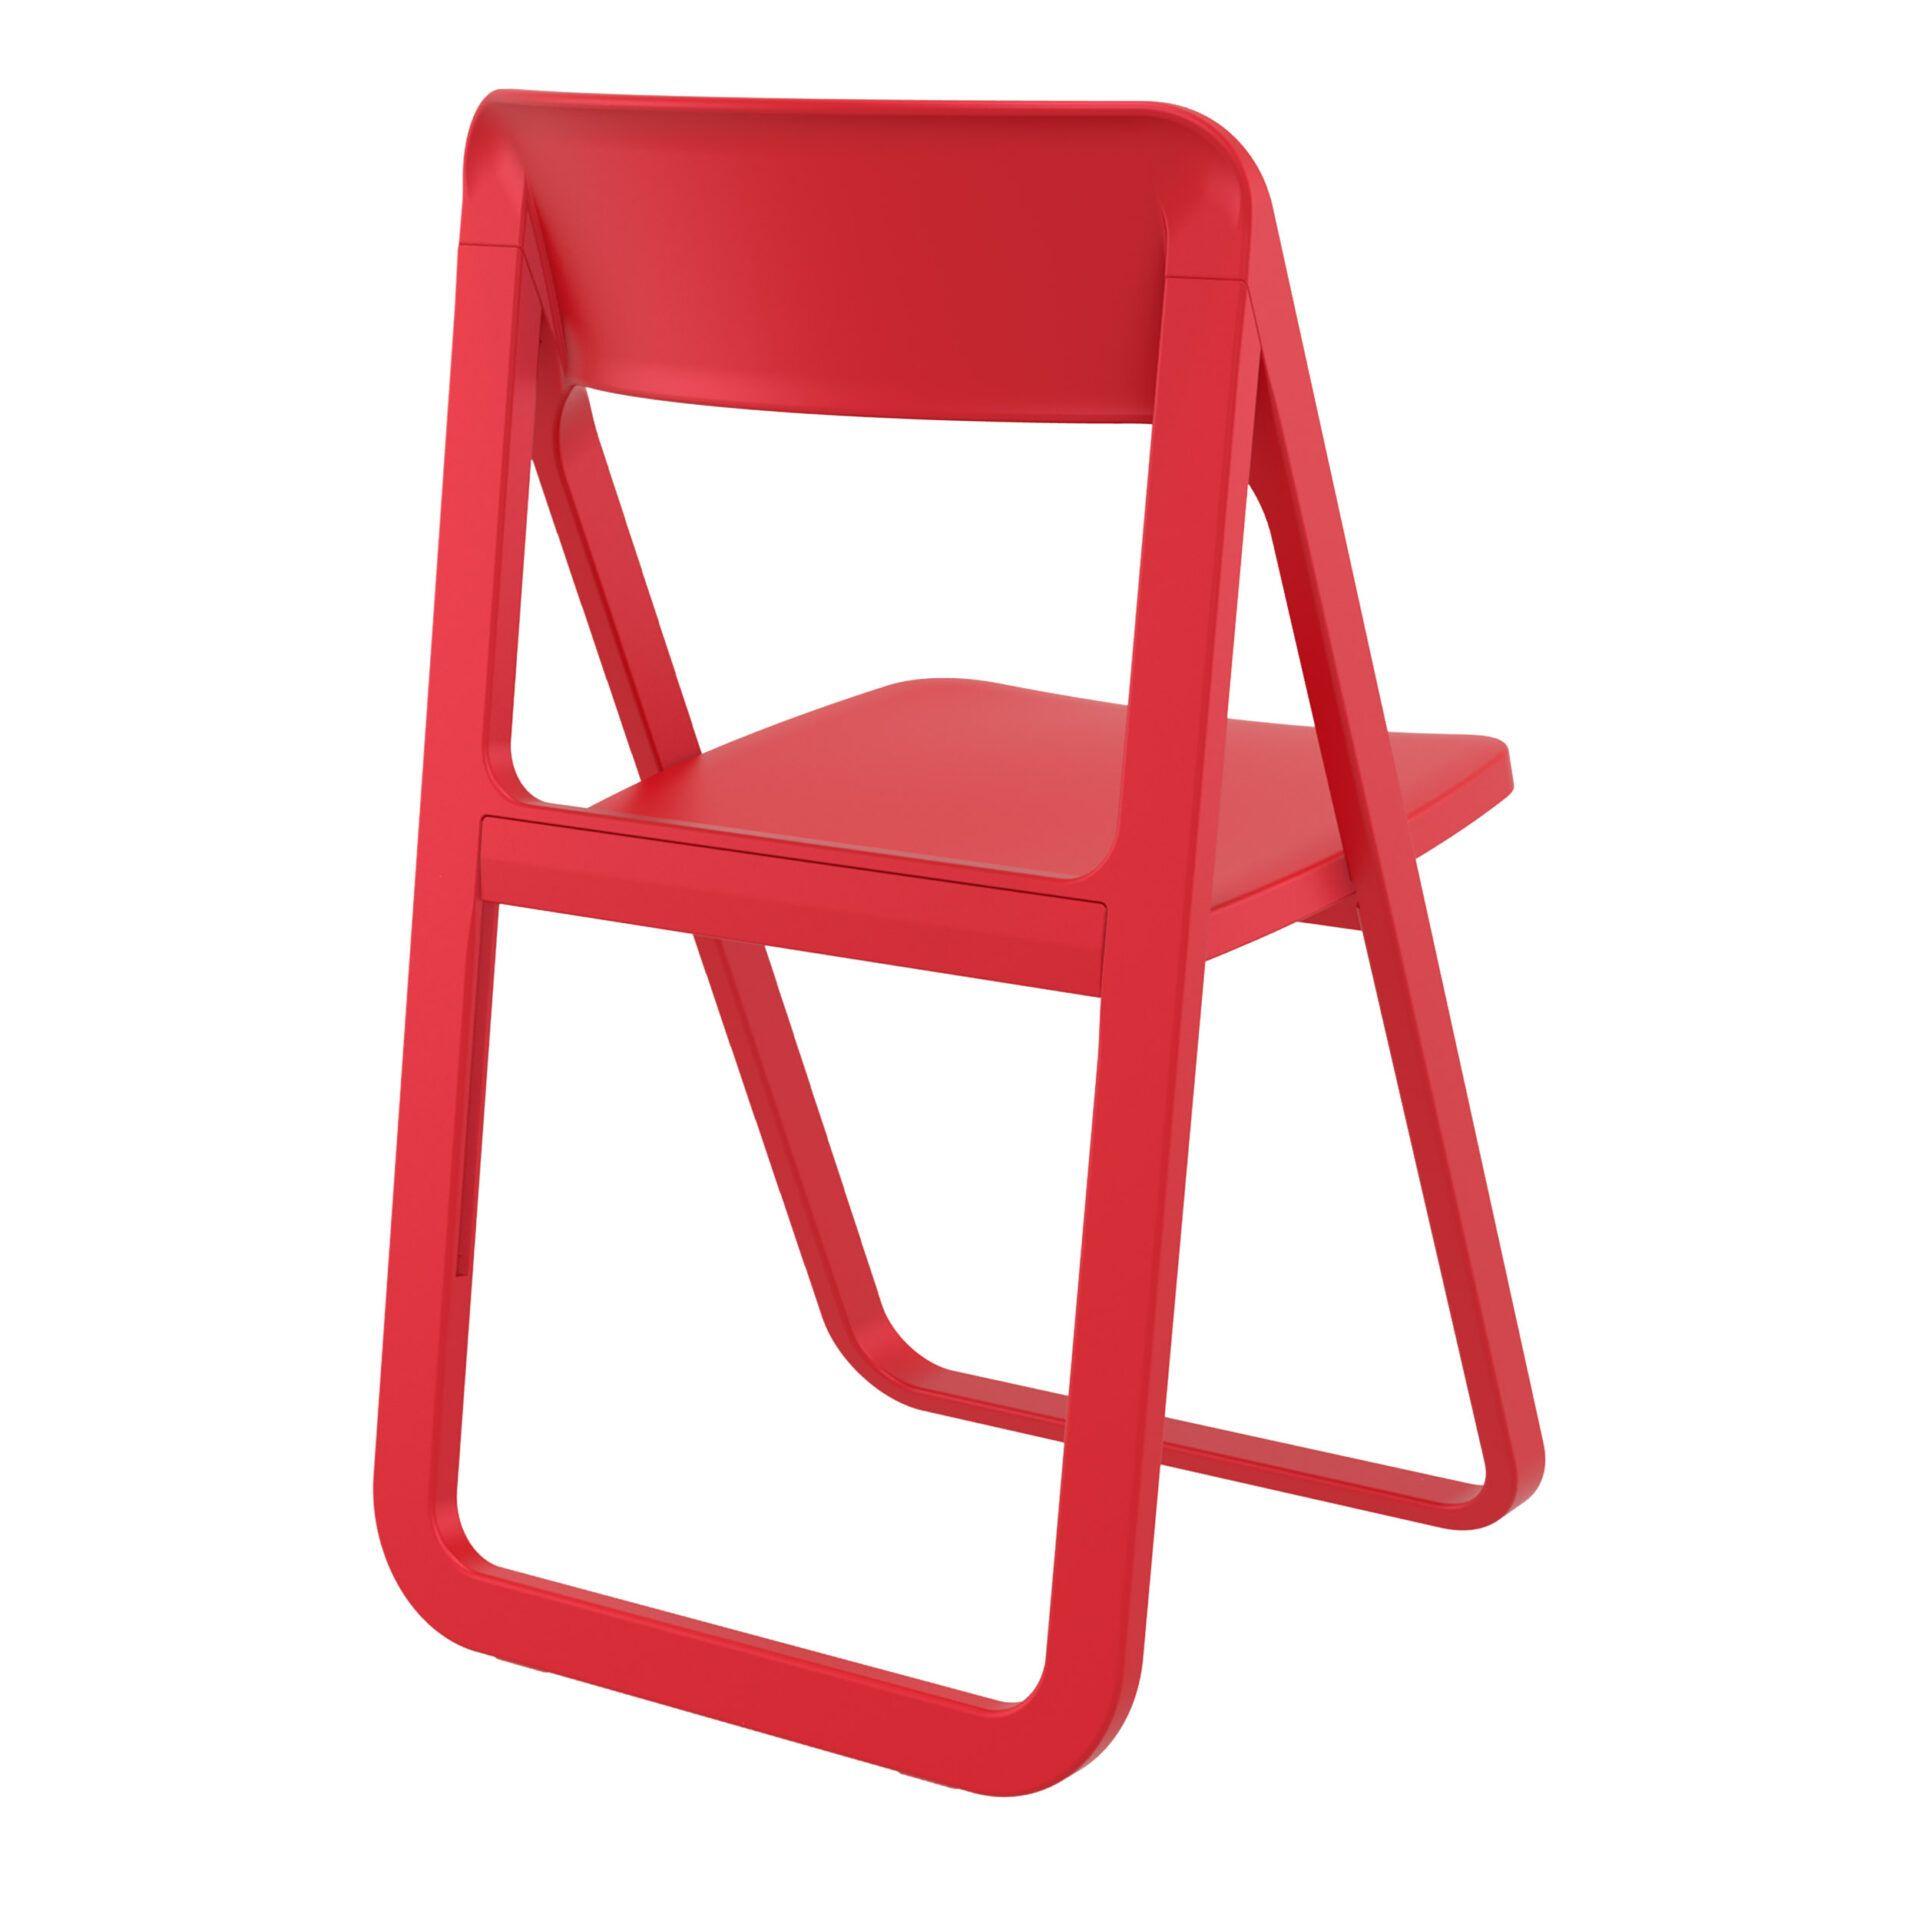 polypropylene dream folding chair red back side